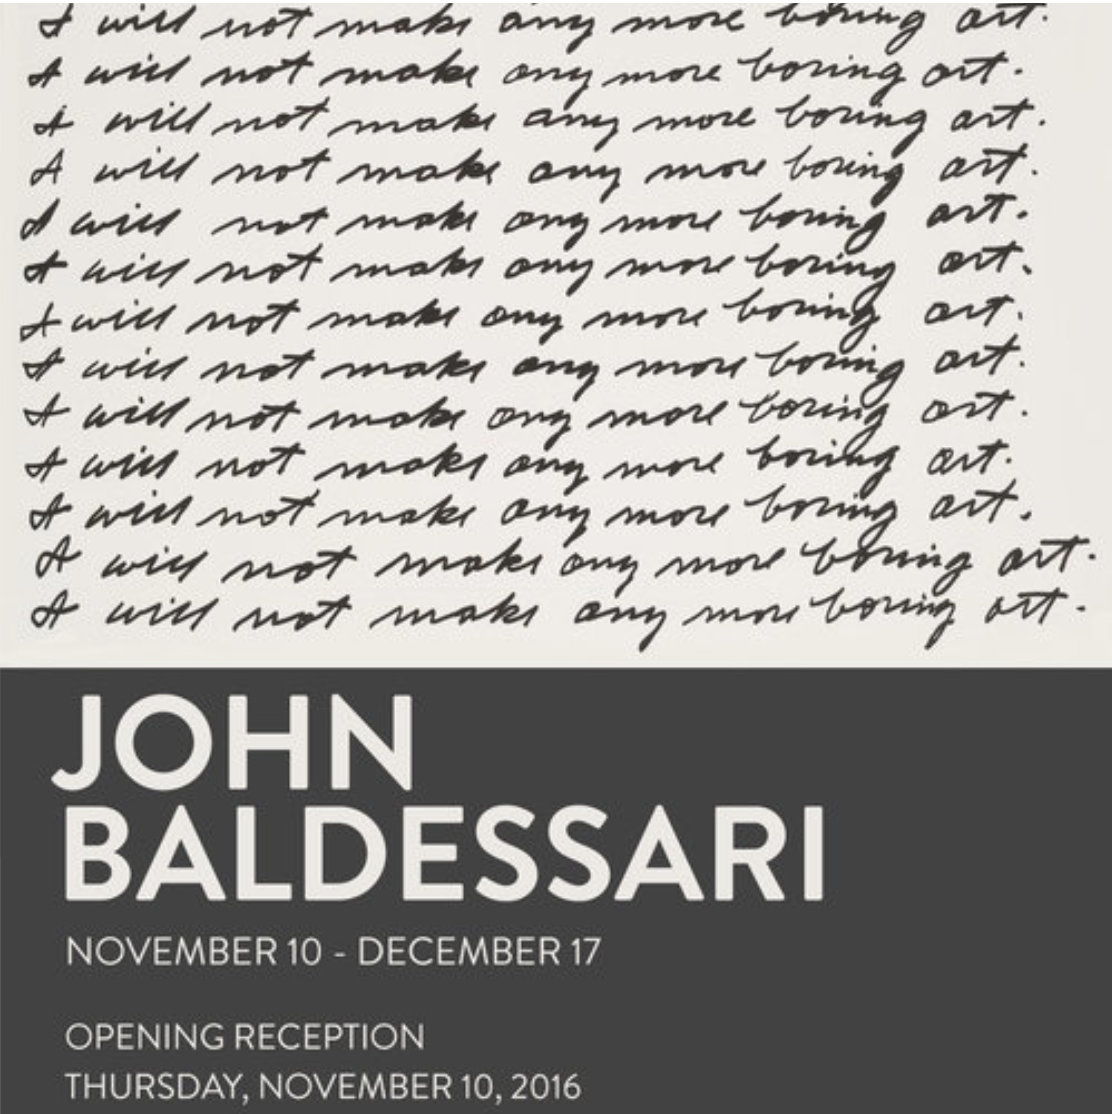 John Baldessari   November 10 - December 17, 2016